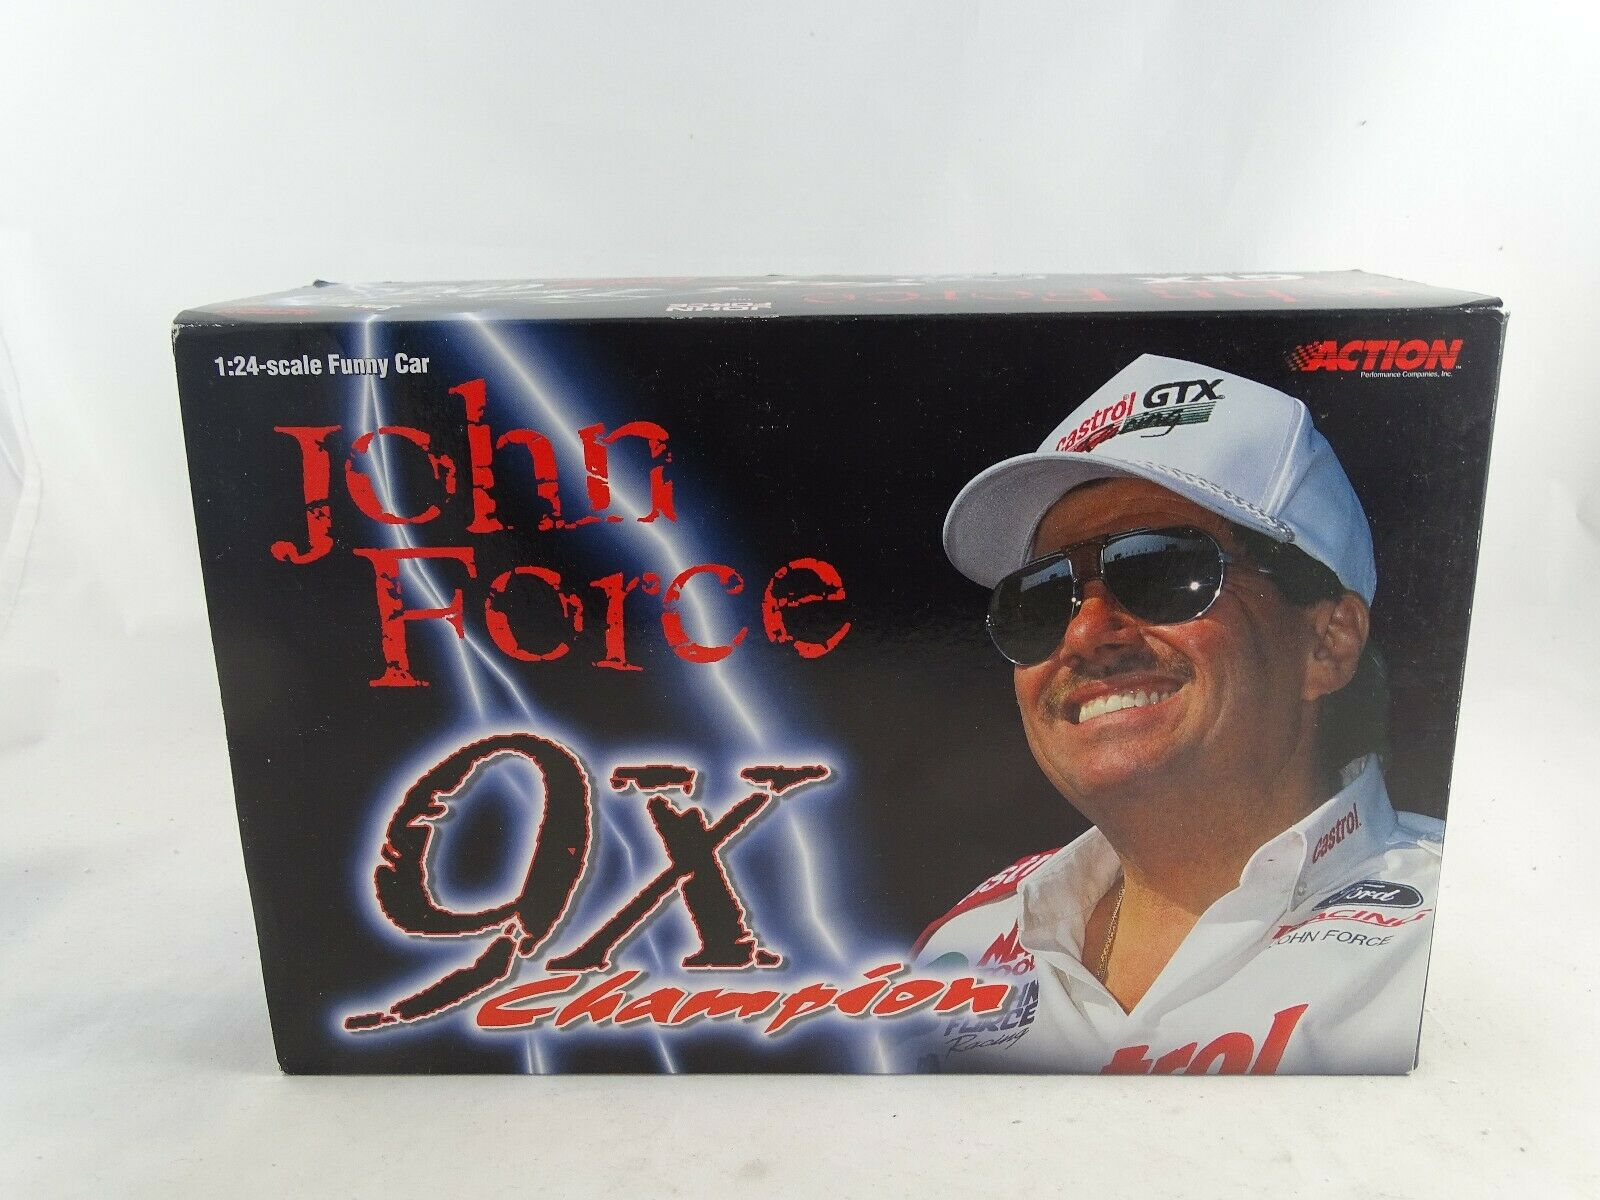 1:16 Action Collectables 2000 Mustang Divertente Auto Castrol GTX John Force